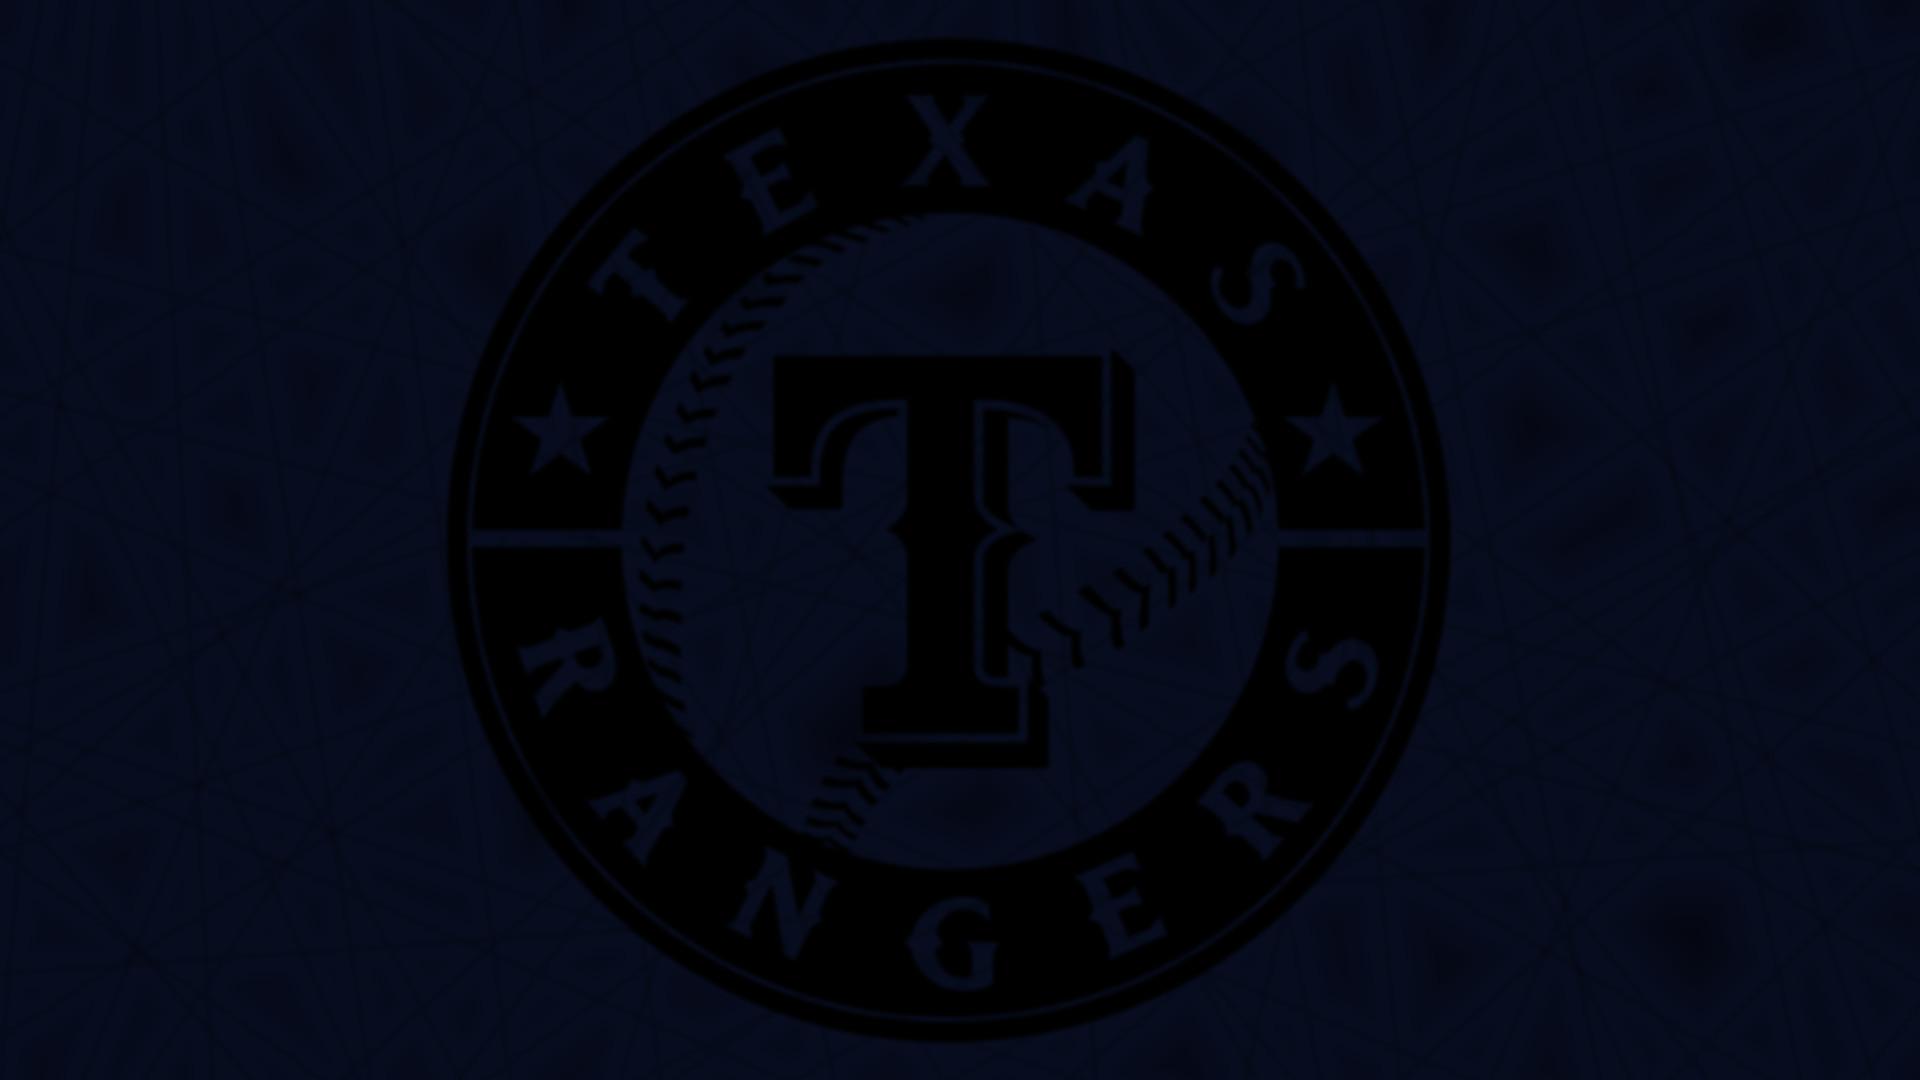 Texas Rangers Wallpapers – Wallpaper Cave